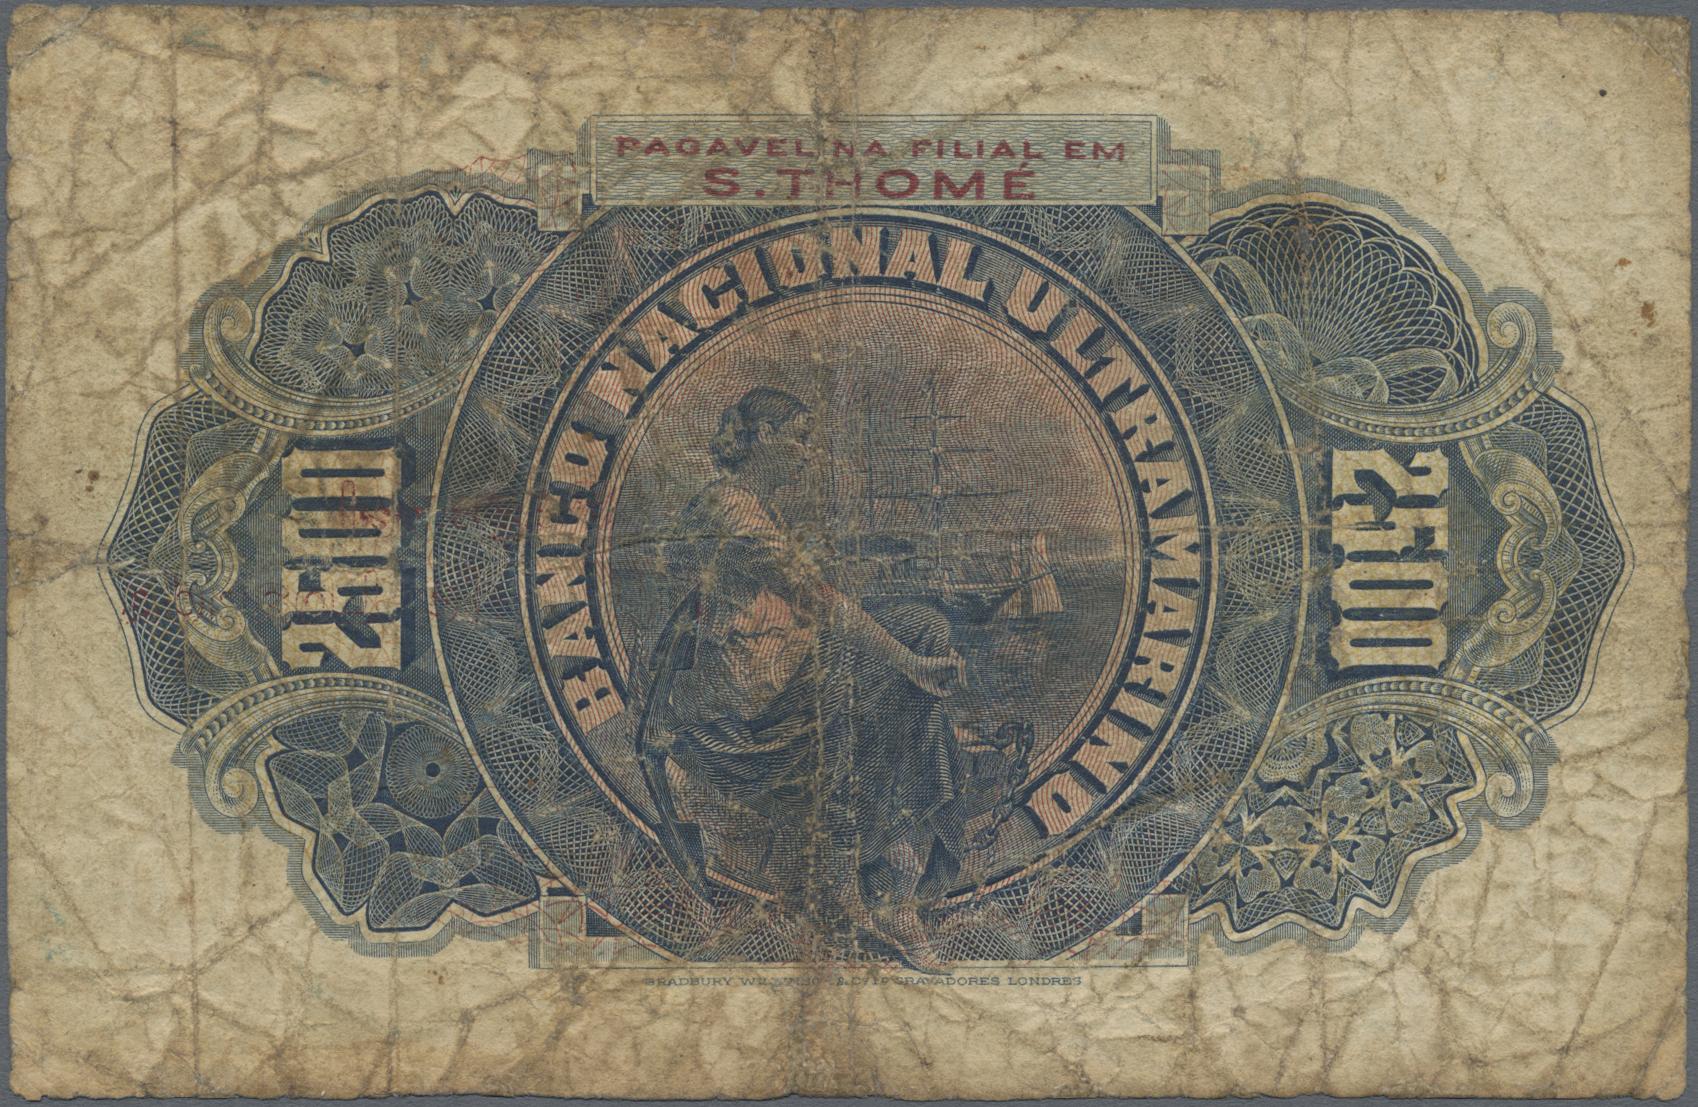 Lot 00025 - Angola | Banknoten  -  Auktionshaus Christoph Gärtner GmbH & Co. KG Sale #46 The Banknotes Worldwide section of the 46th Christoph Gärtner Auction